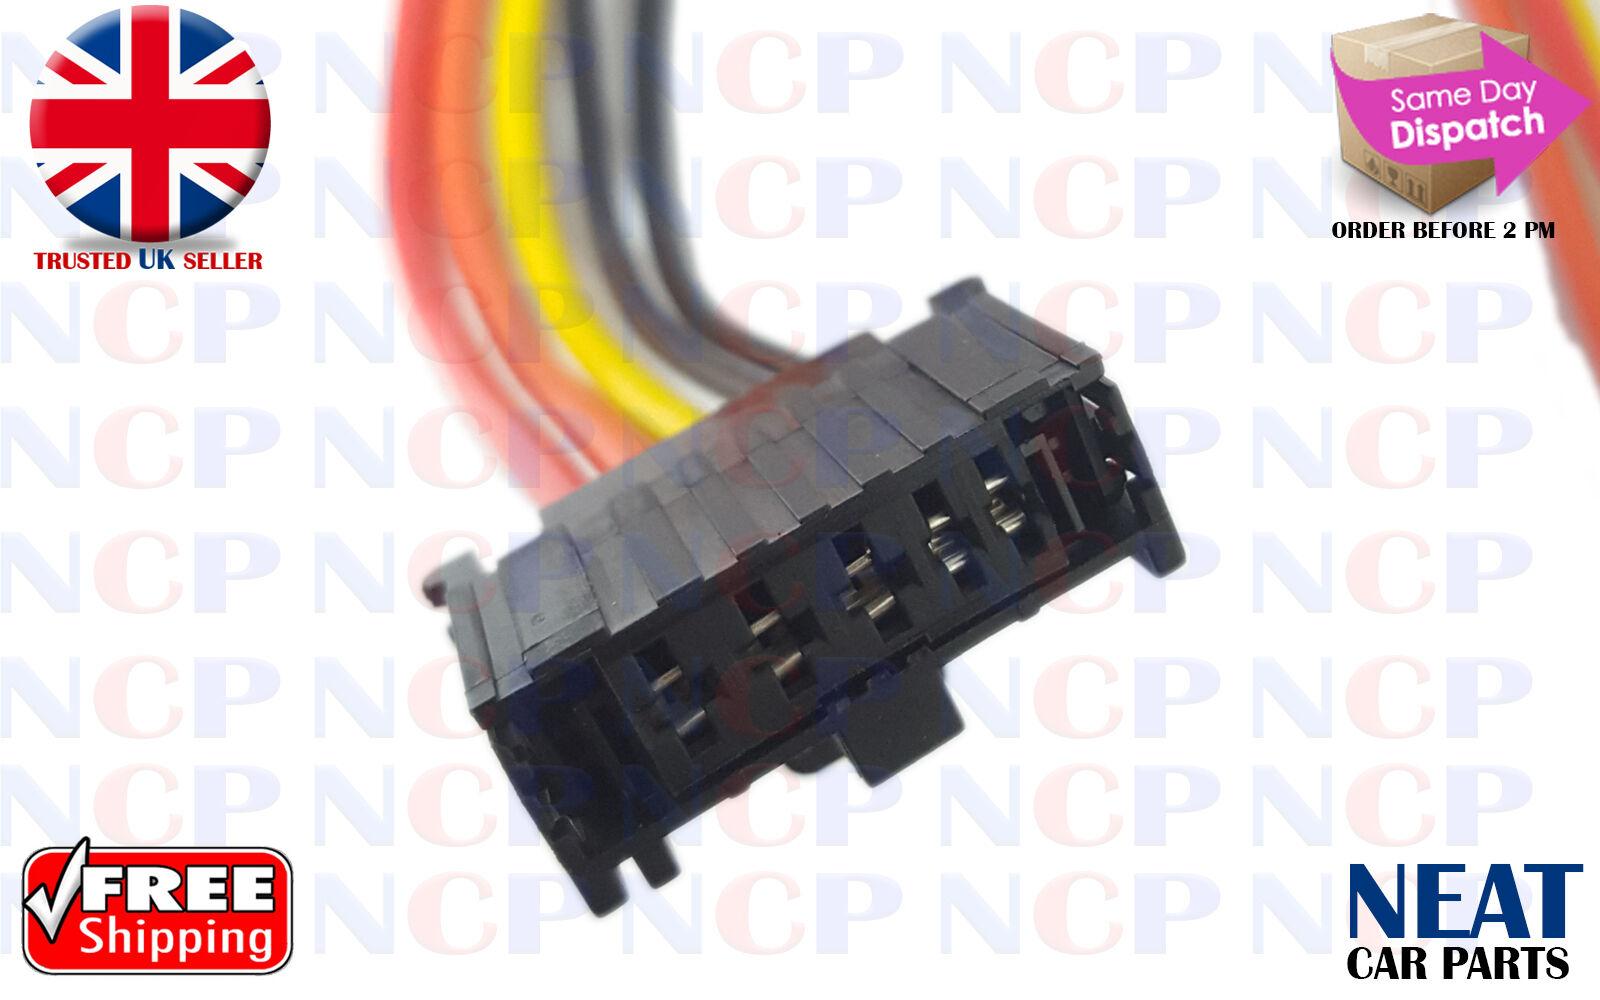 Wiring Loom Harness For Heater Blower Motor Resistor For 307 : Peugeot heater blower motor resistor wiring loom